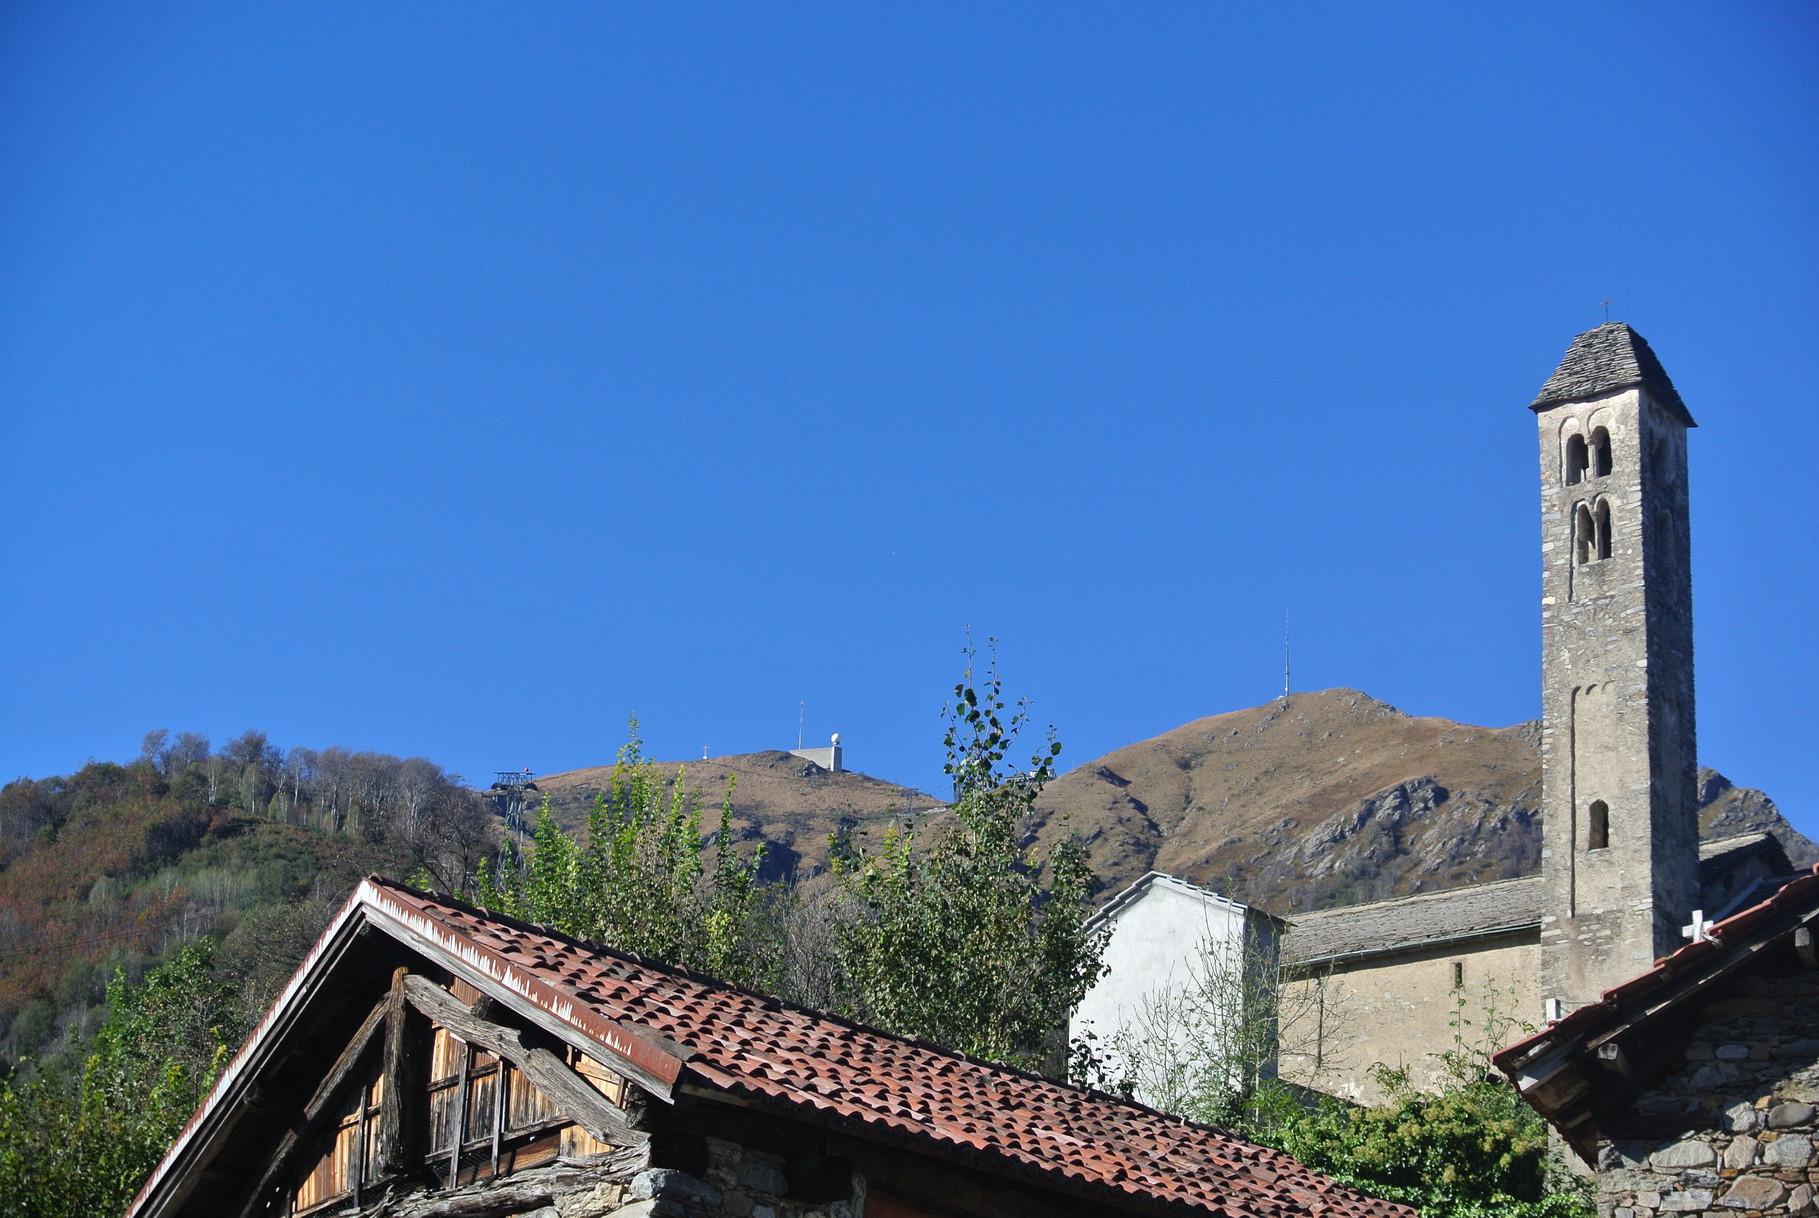 vue de Miglieglia sur le Monte Lema